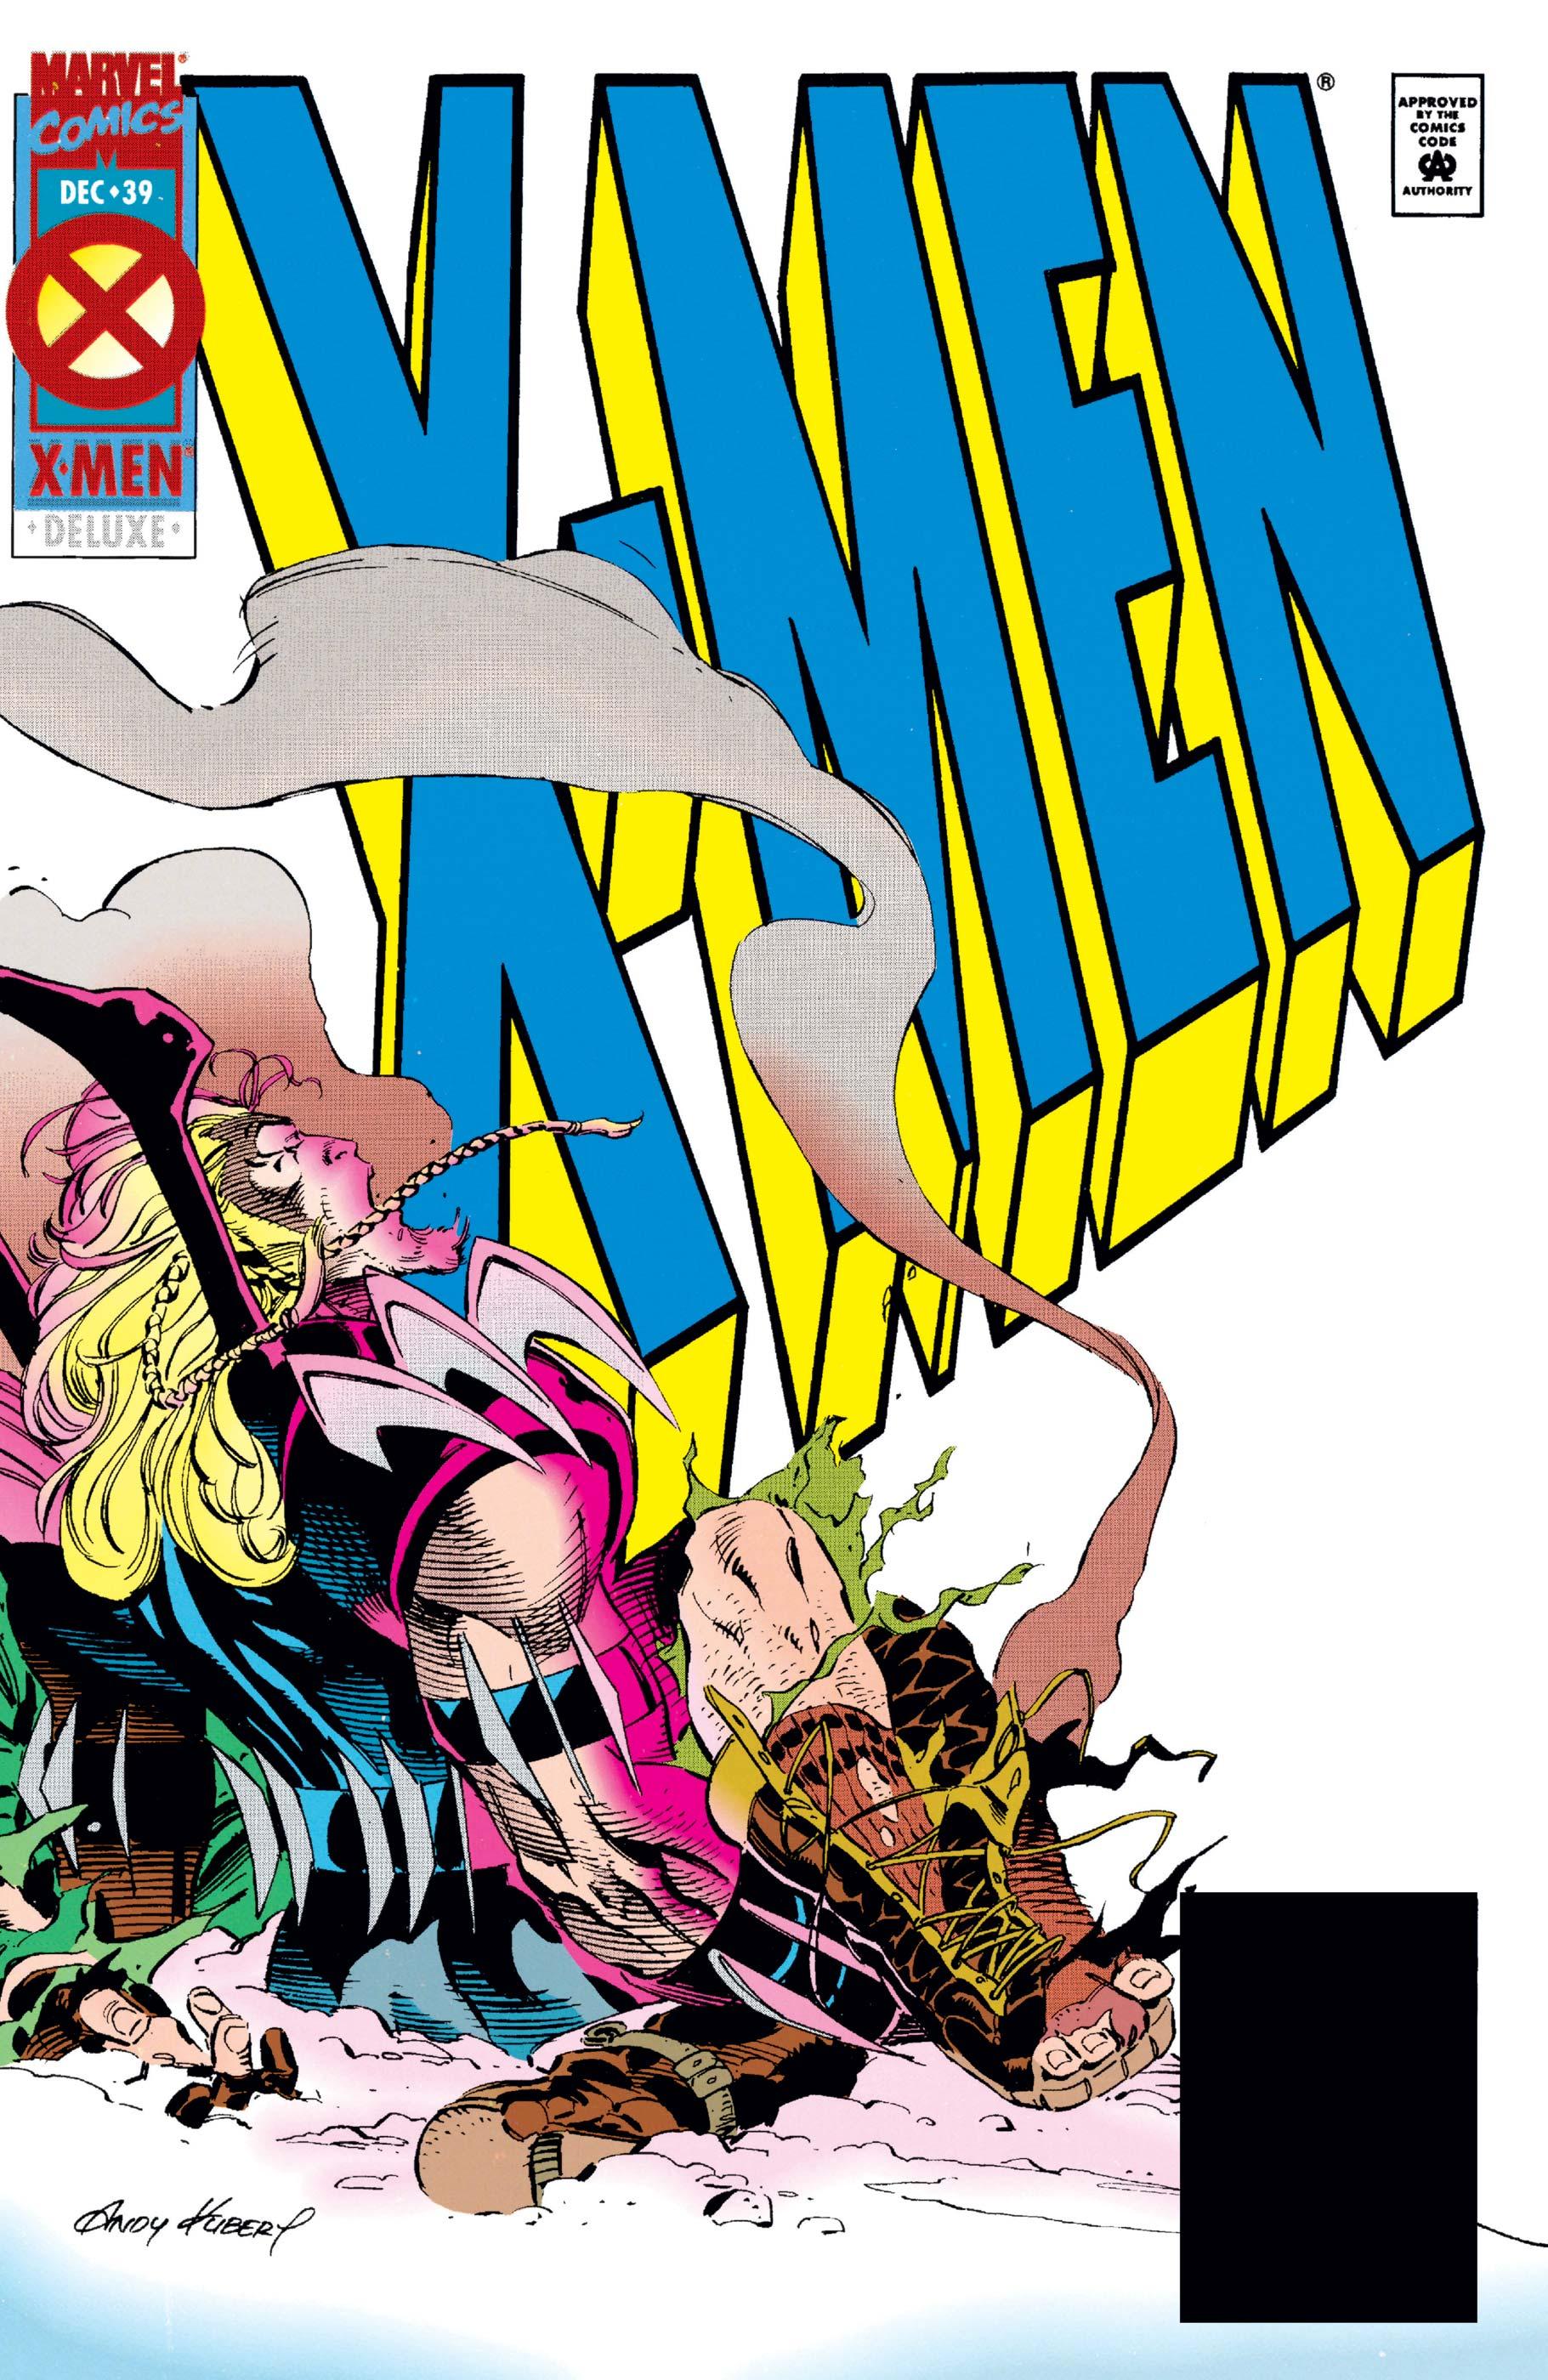 X-Men (1991) #39